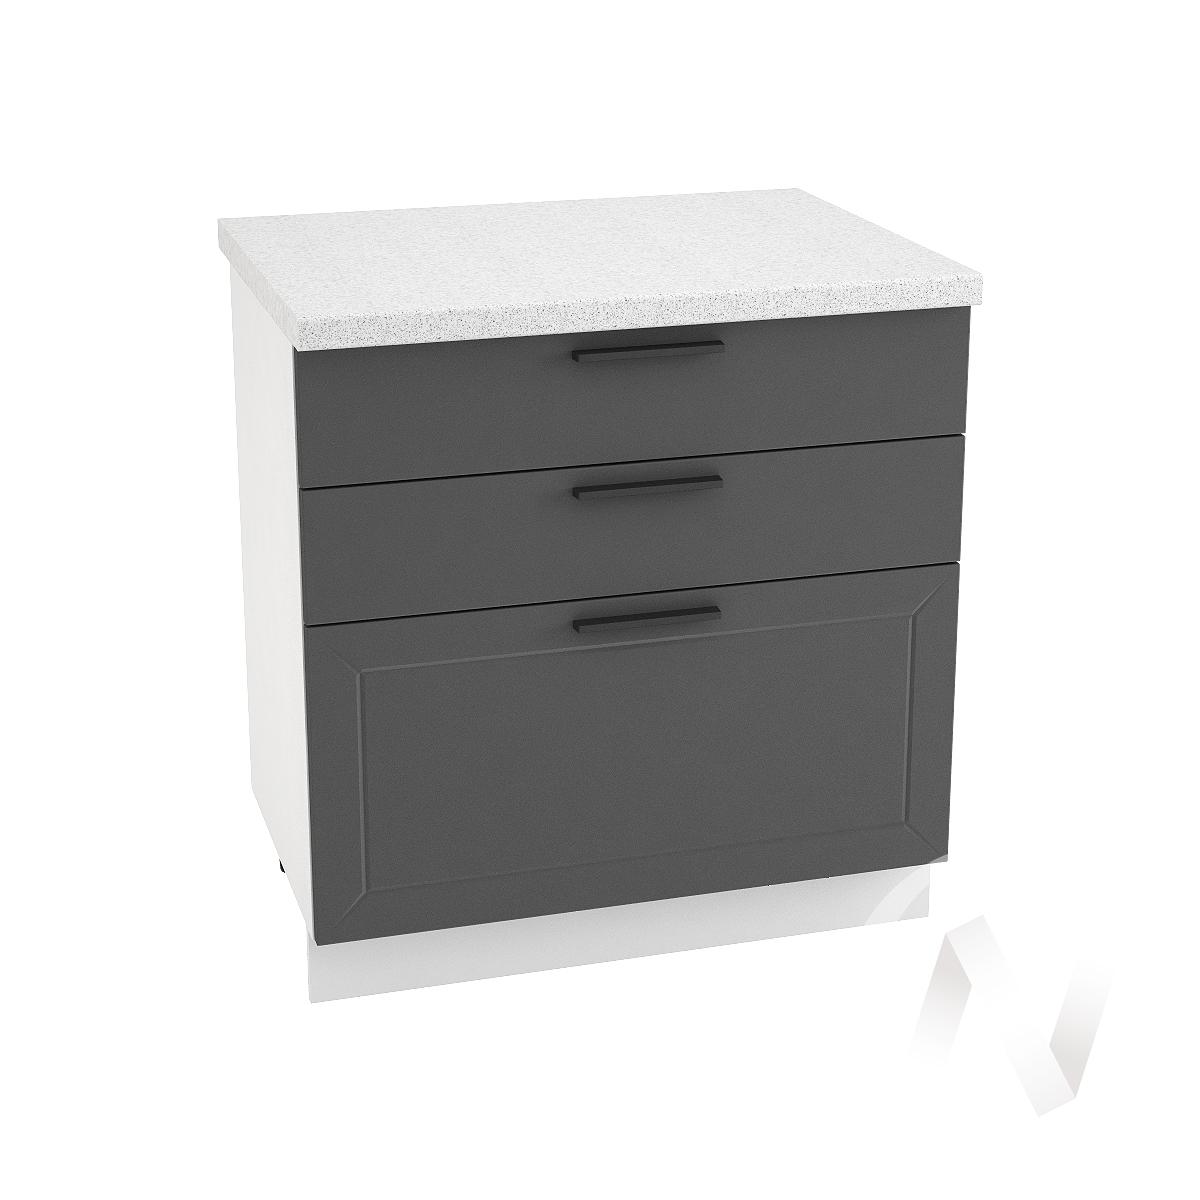 "Кухня ""Глетчер"": Шкаф нижний с 3-мя ящиками 800, ШН3Я 800 (Маренго силк/корпус белый)"